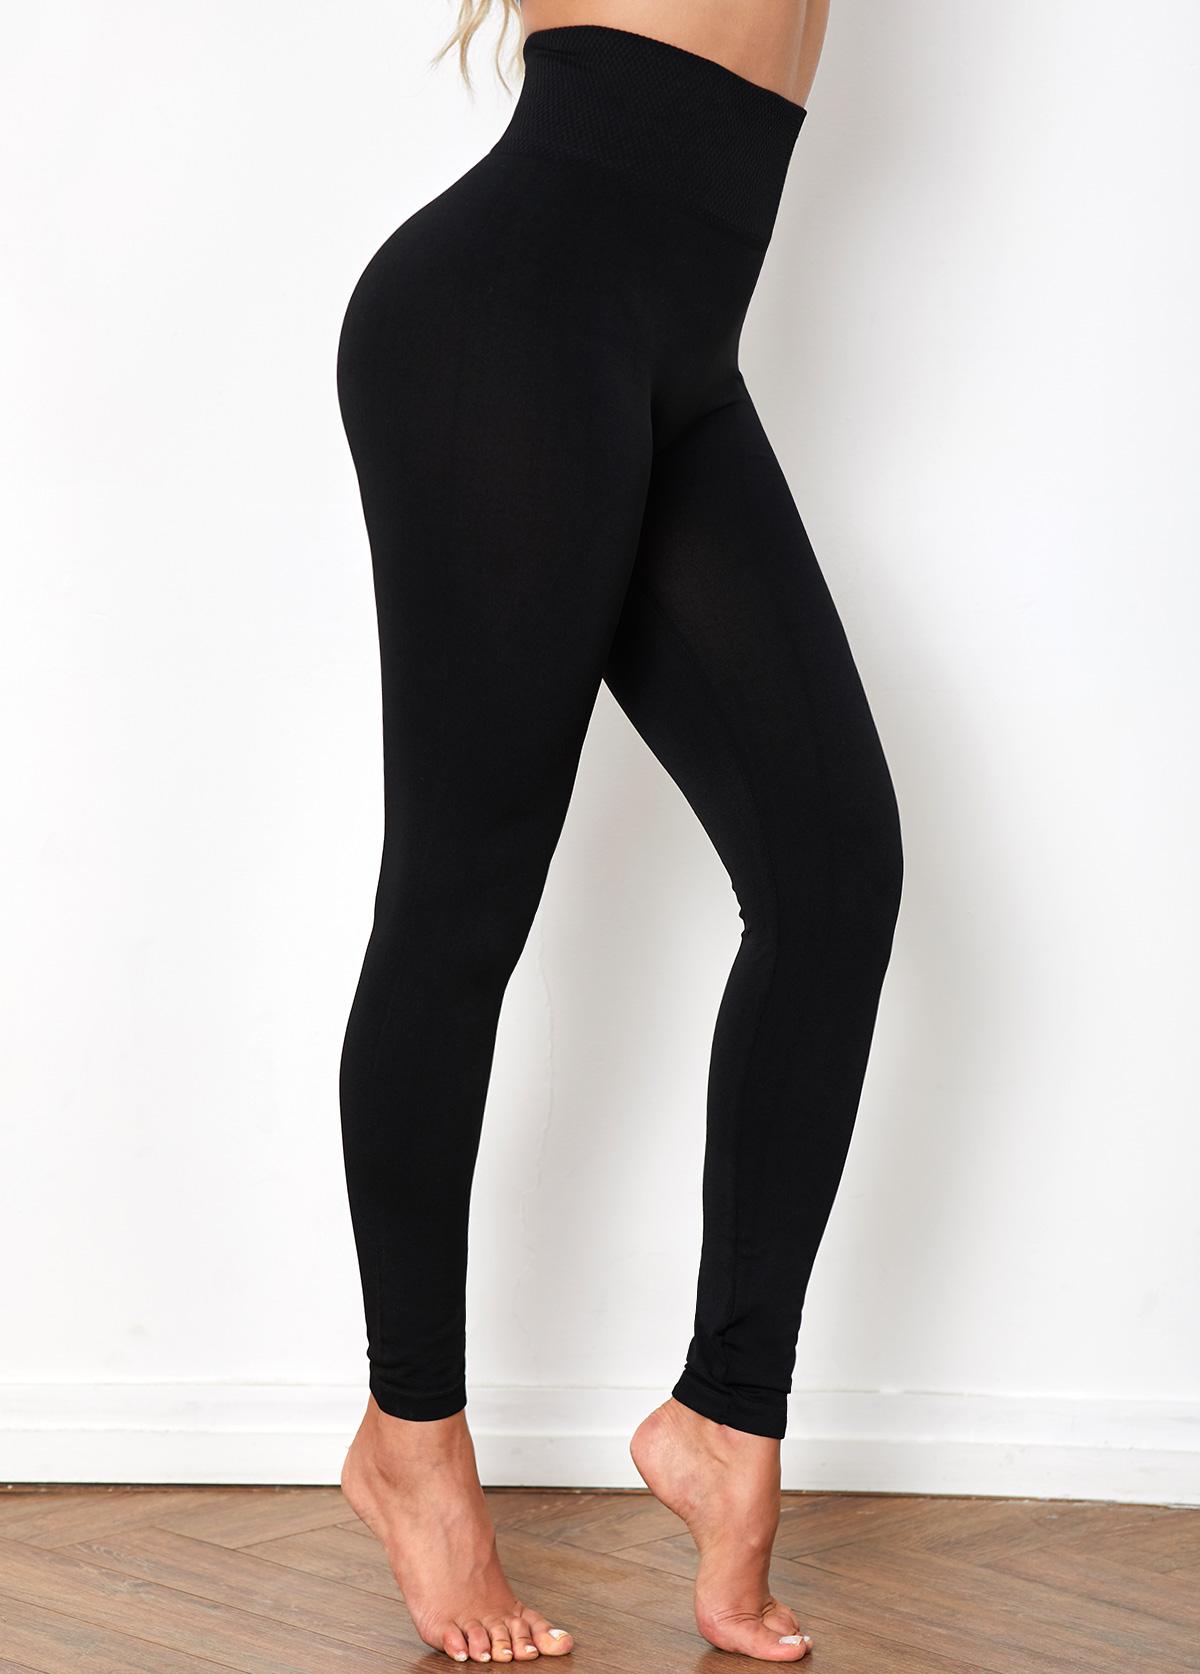 High Waist Super Elastic Black Legging